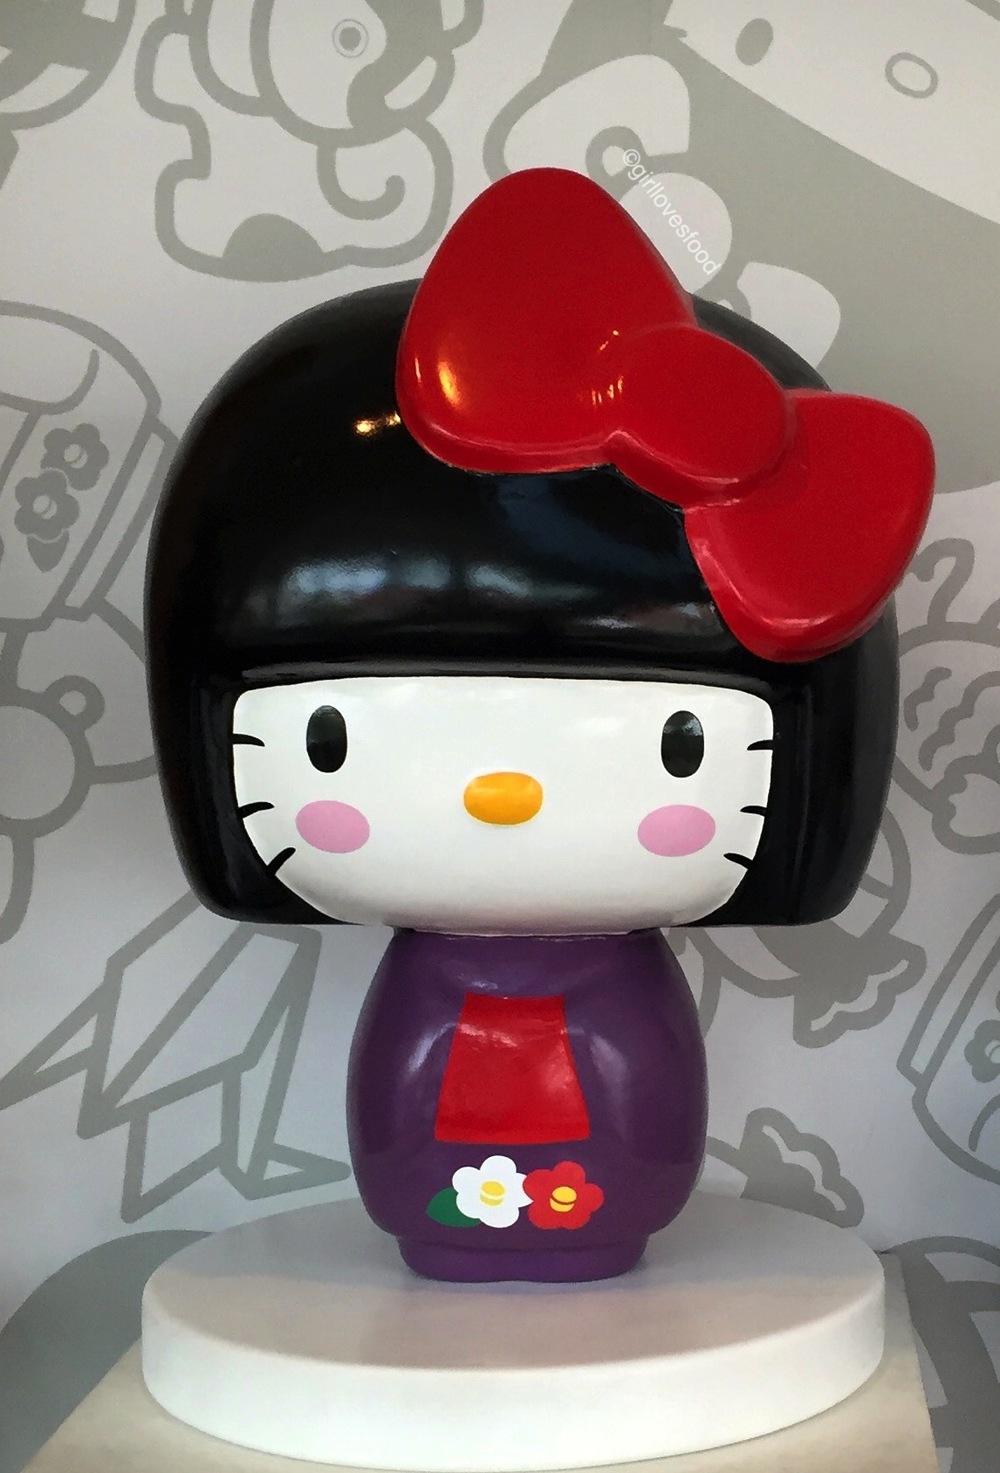 hello kitty japanese doll, hello kitty kimono, los angeles hello kitty stores,japanese american national museum exhibits, hello super cute world of hello kitty, pictures inside hello kitty museum, los angeles hello kitty museum